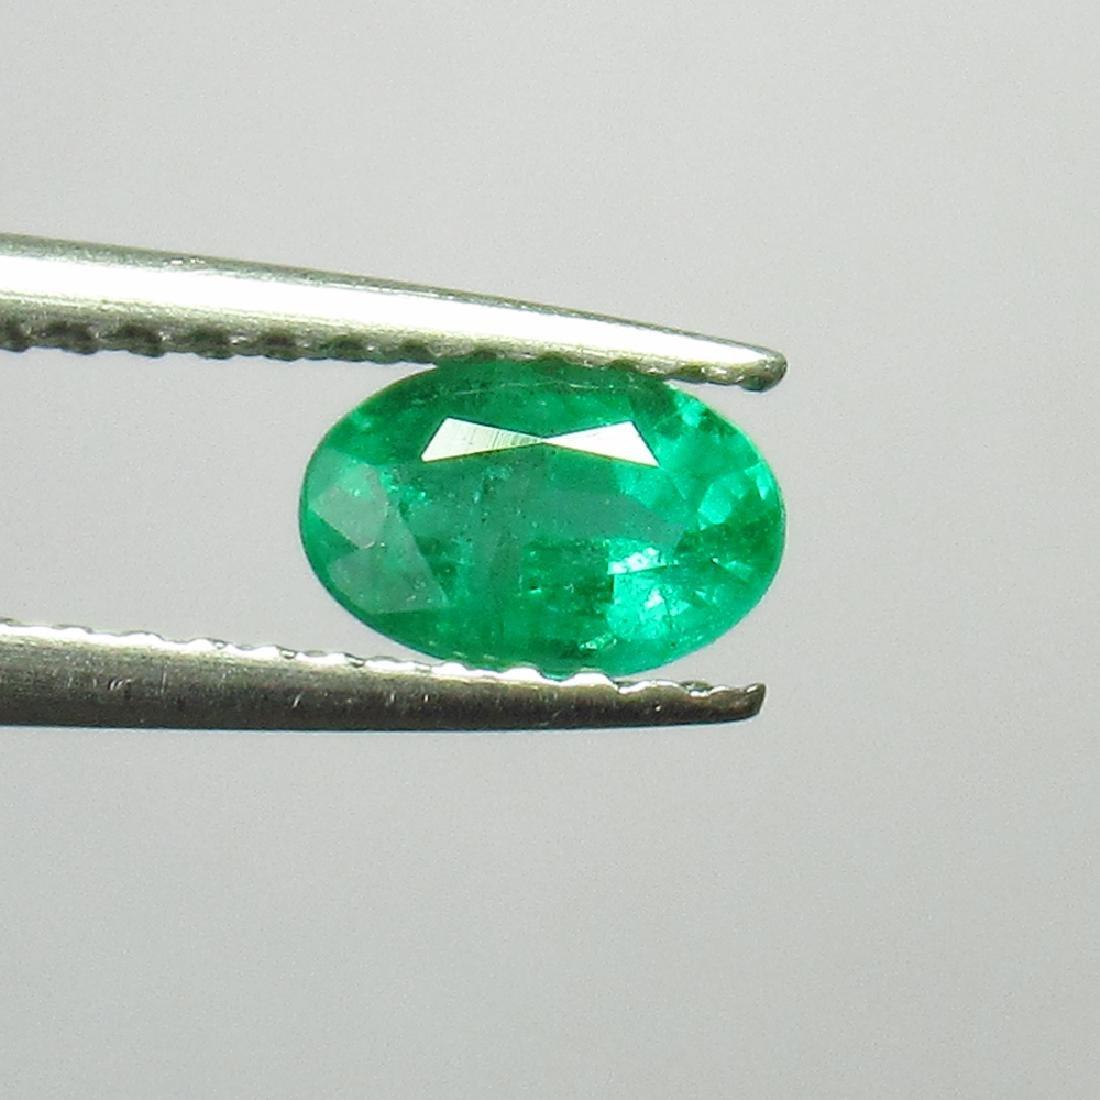 0.51 Ct Genuine Zambian Emerald 6X4 mm Oval Cut